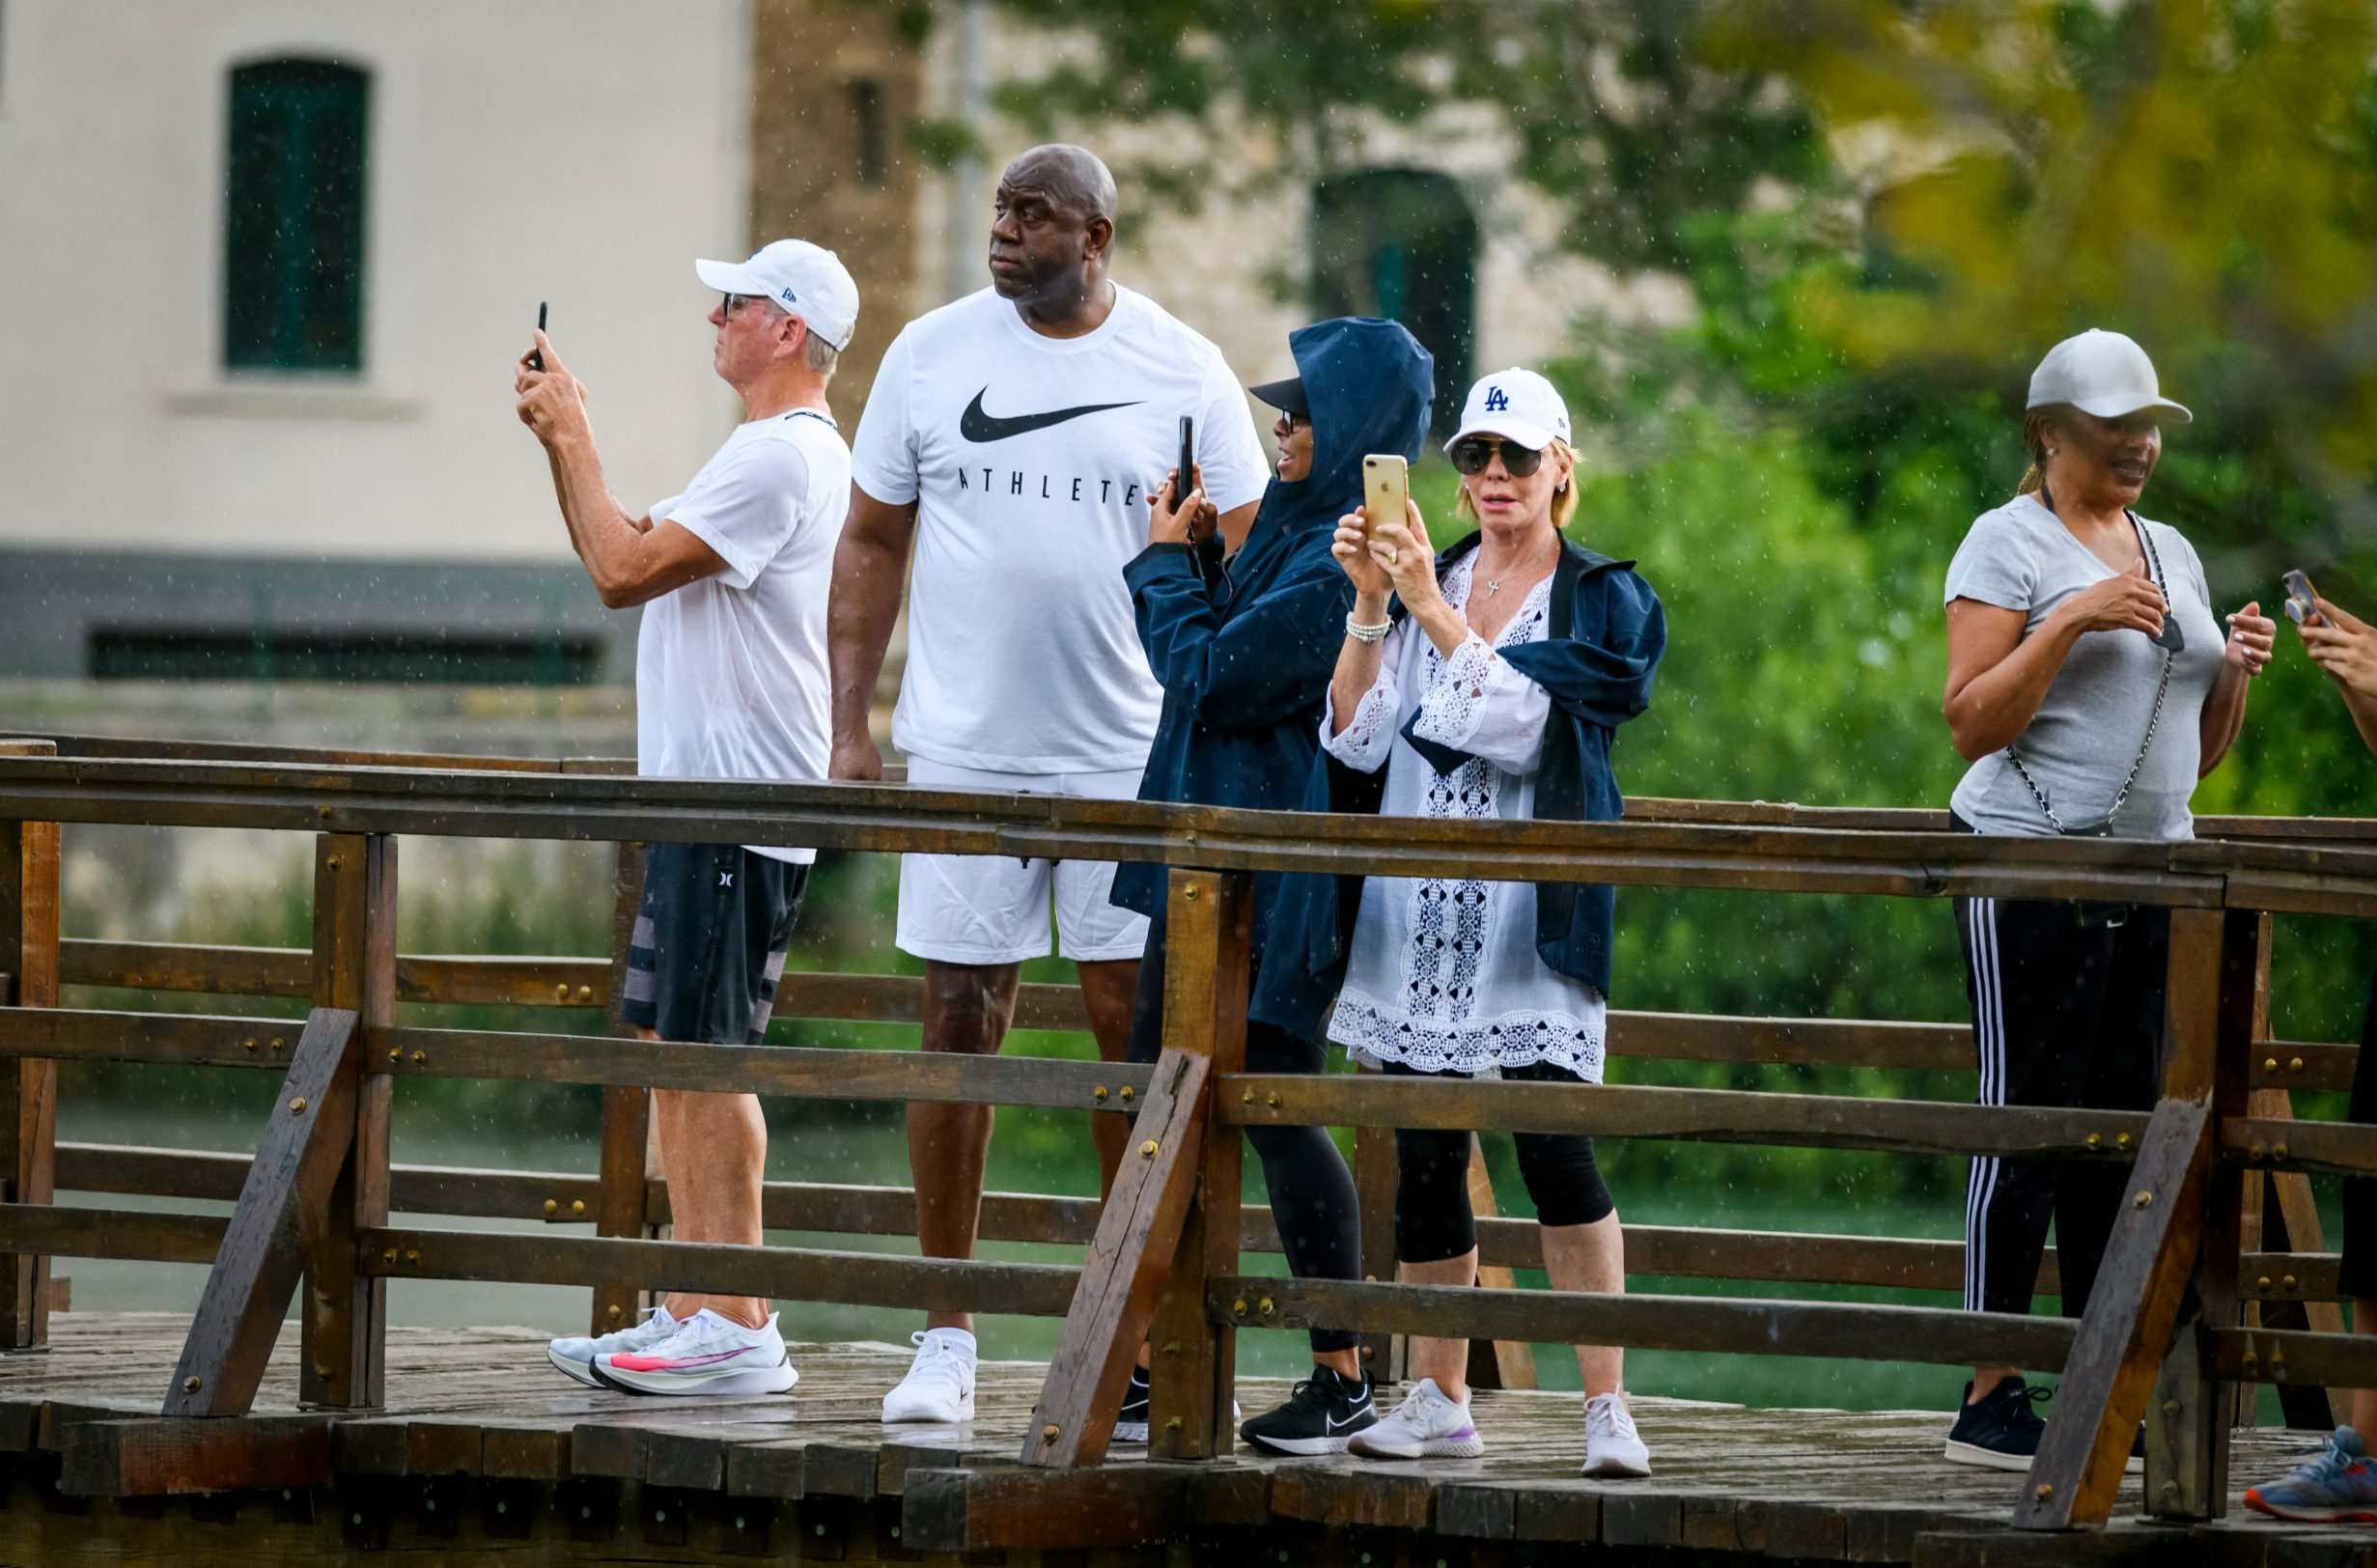 Skradinski buk, 070820. Proslavljeni americki kosarkas Magic Johnson sa obitelji posjetio je danas slapove Krke. Foto: Niksa Stipanicev / CROPIX